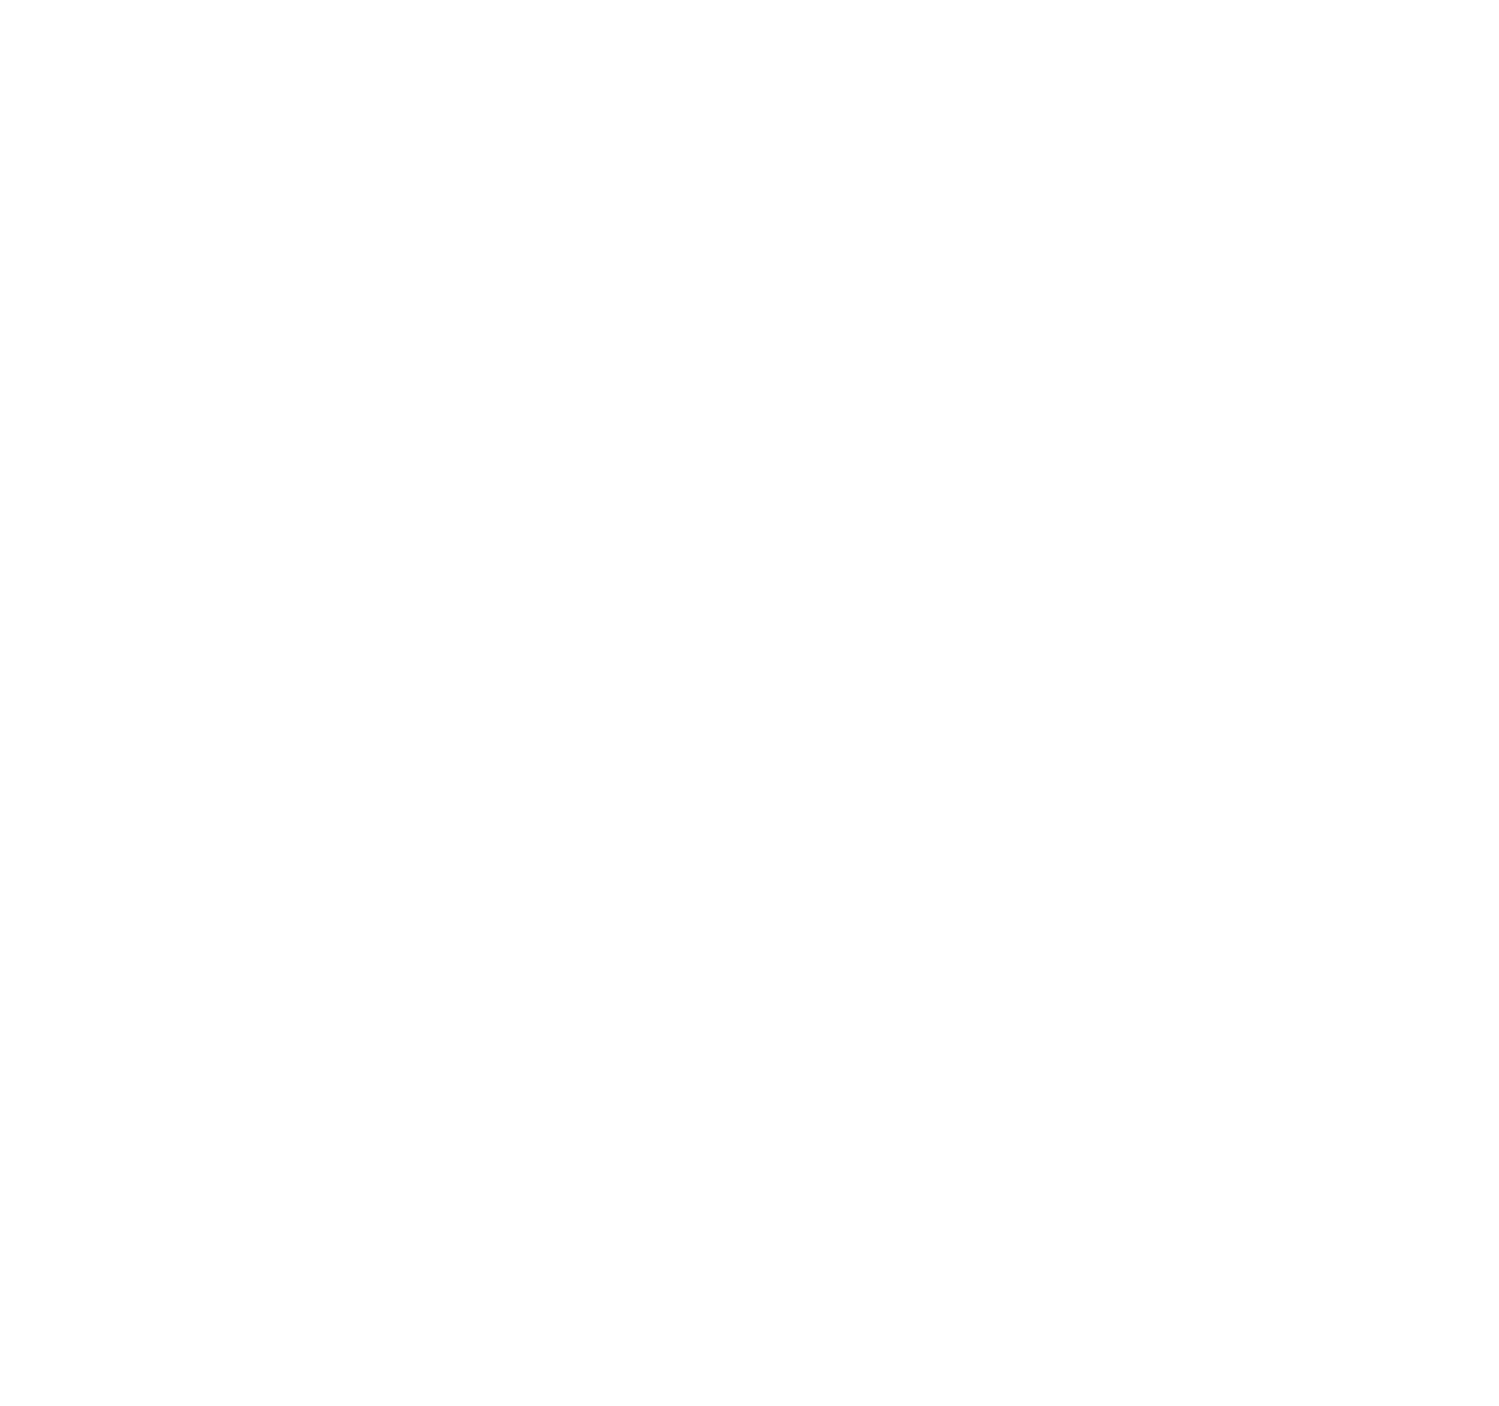 Procuratio